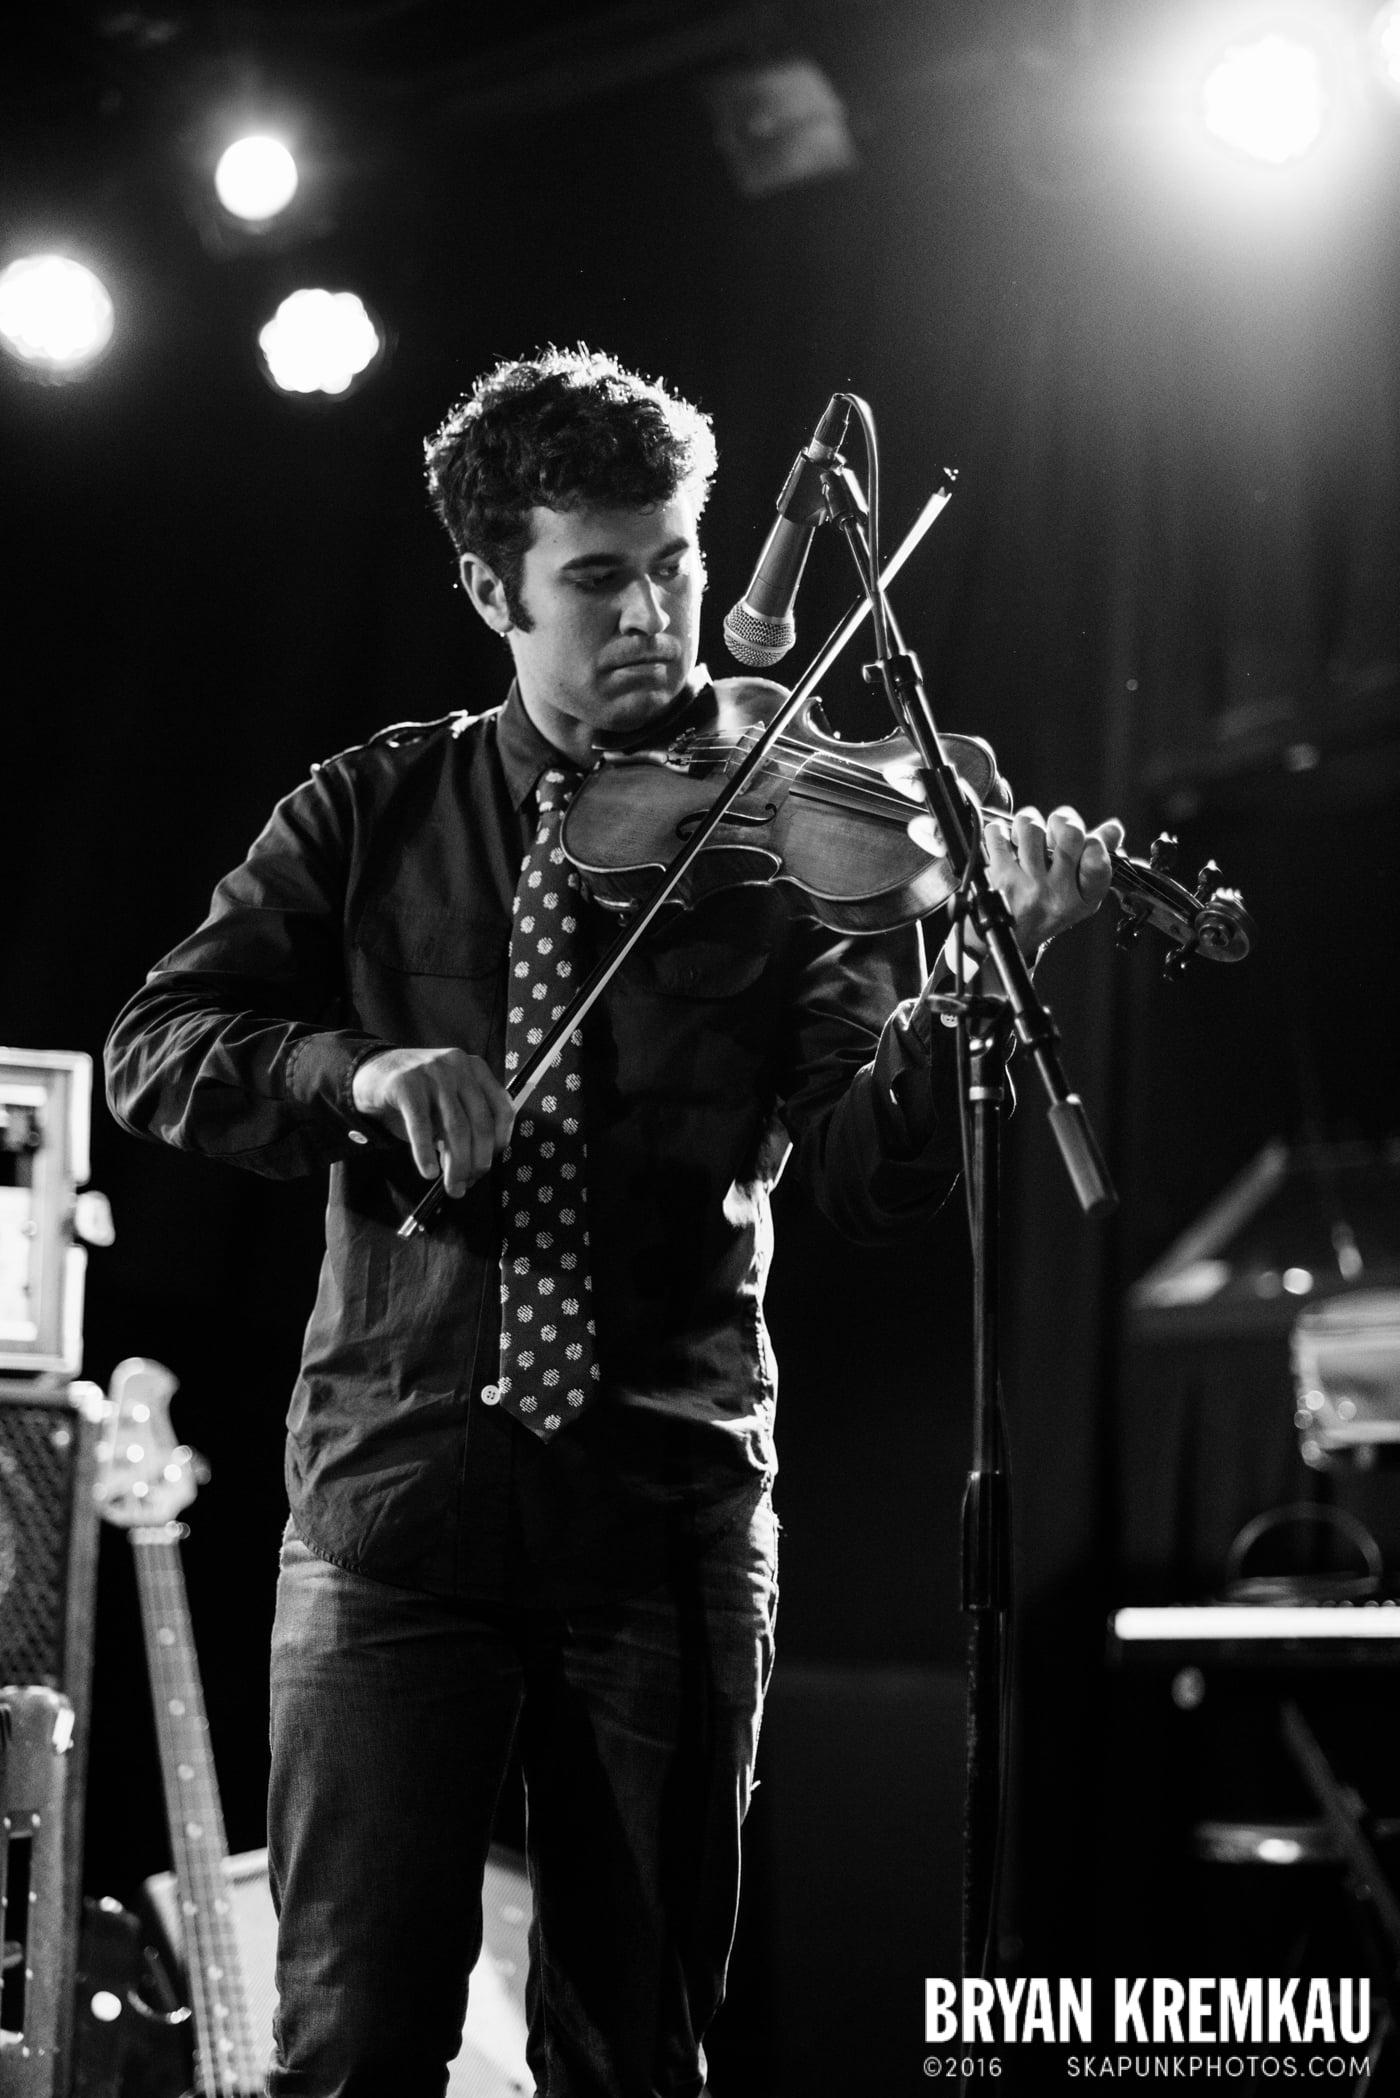 Danny Burns Band @ Knitting Factory, Brooklyn, NY - 9.10.14 (13)